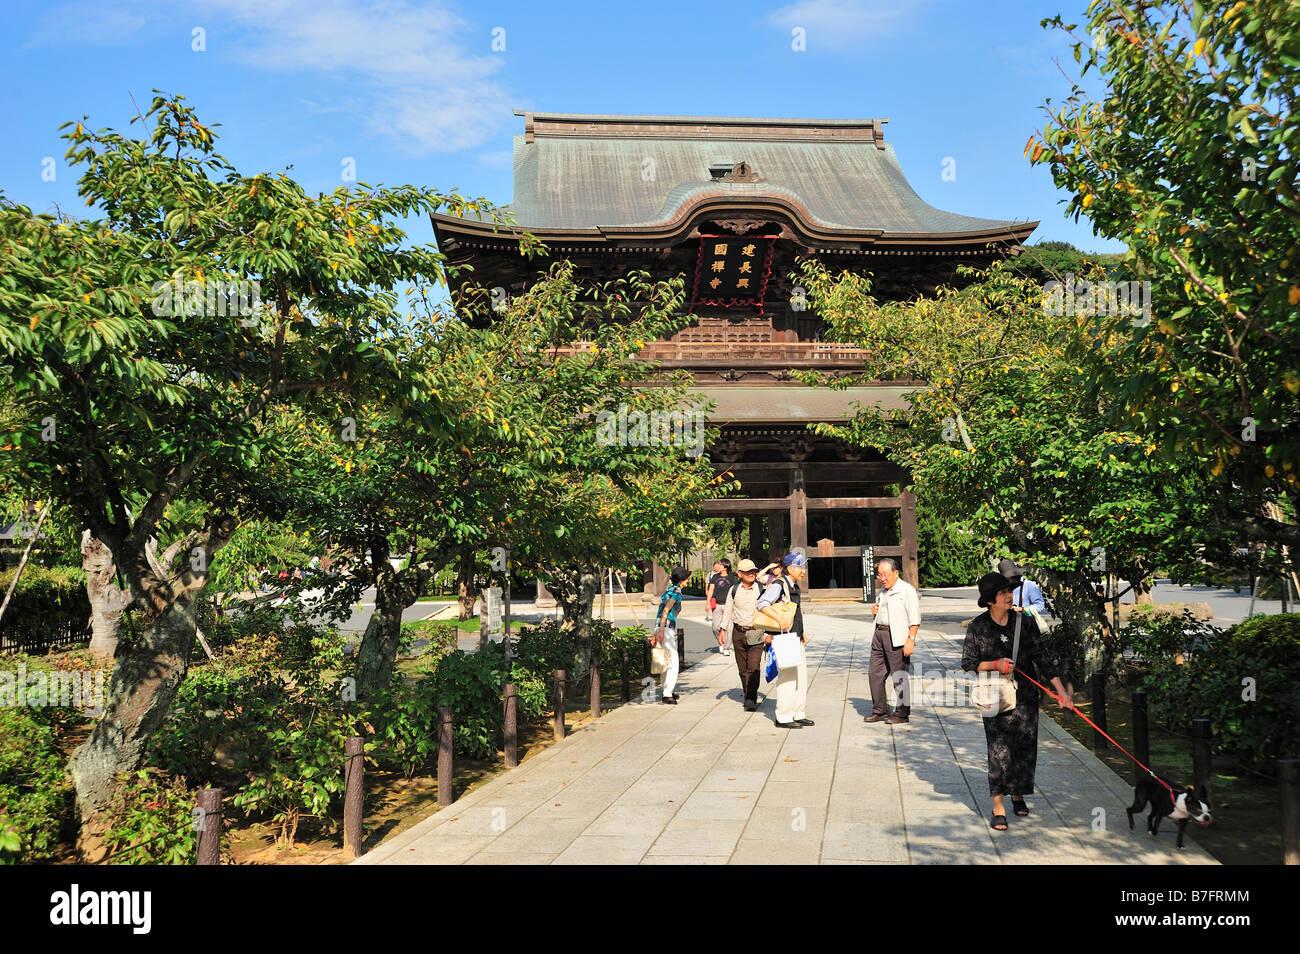 Kencho-ji, Kamakura, Kanagawa Prefecture, Japan - Stock Image